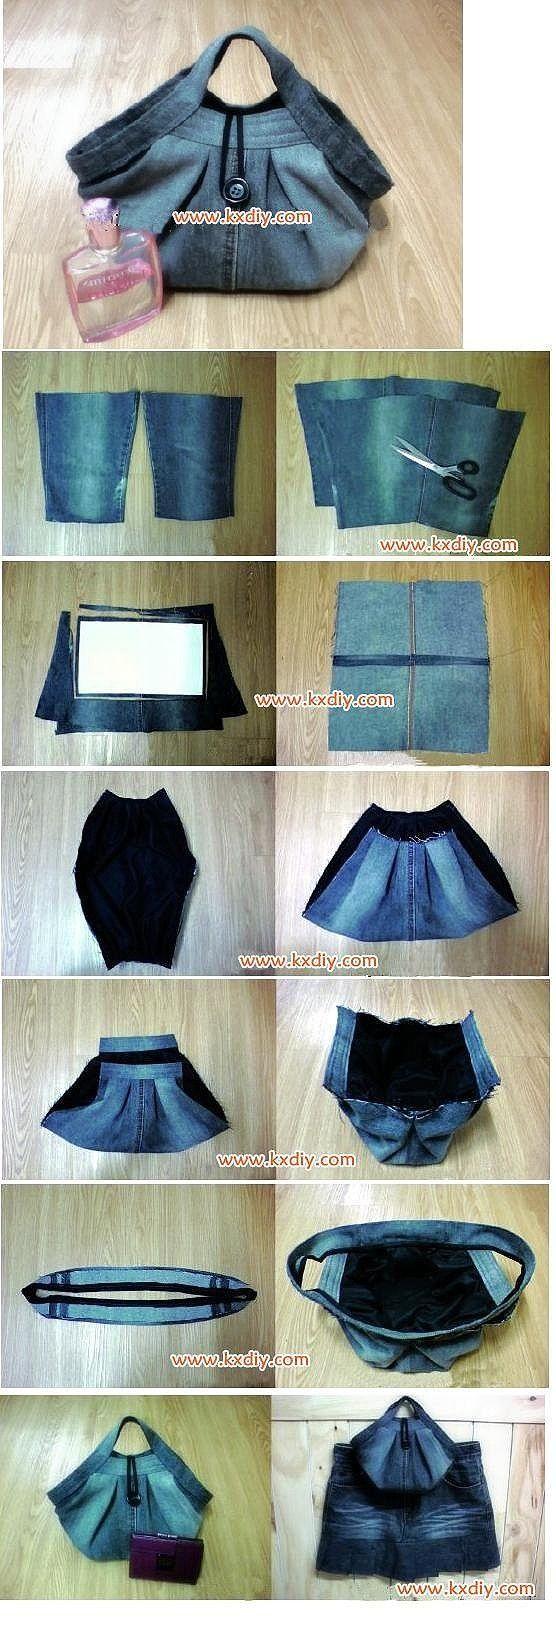 DIY Stylish Handbag from Used Jeans   iCreativeIdeas.com Like Us on Facebook ==> https://www.facebook.com/icreativeideas: